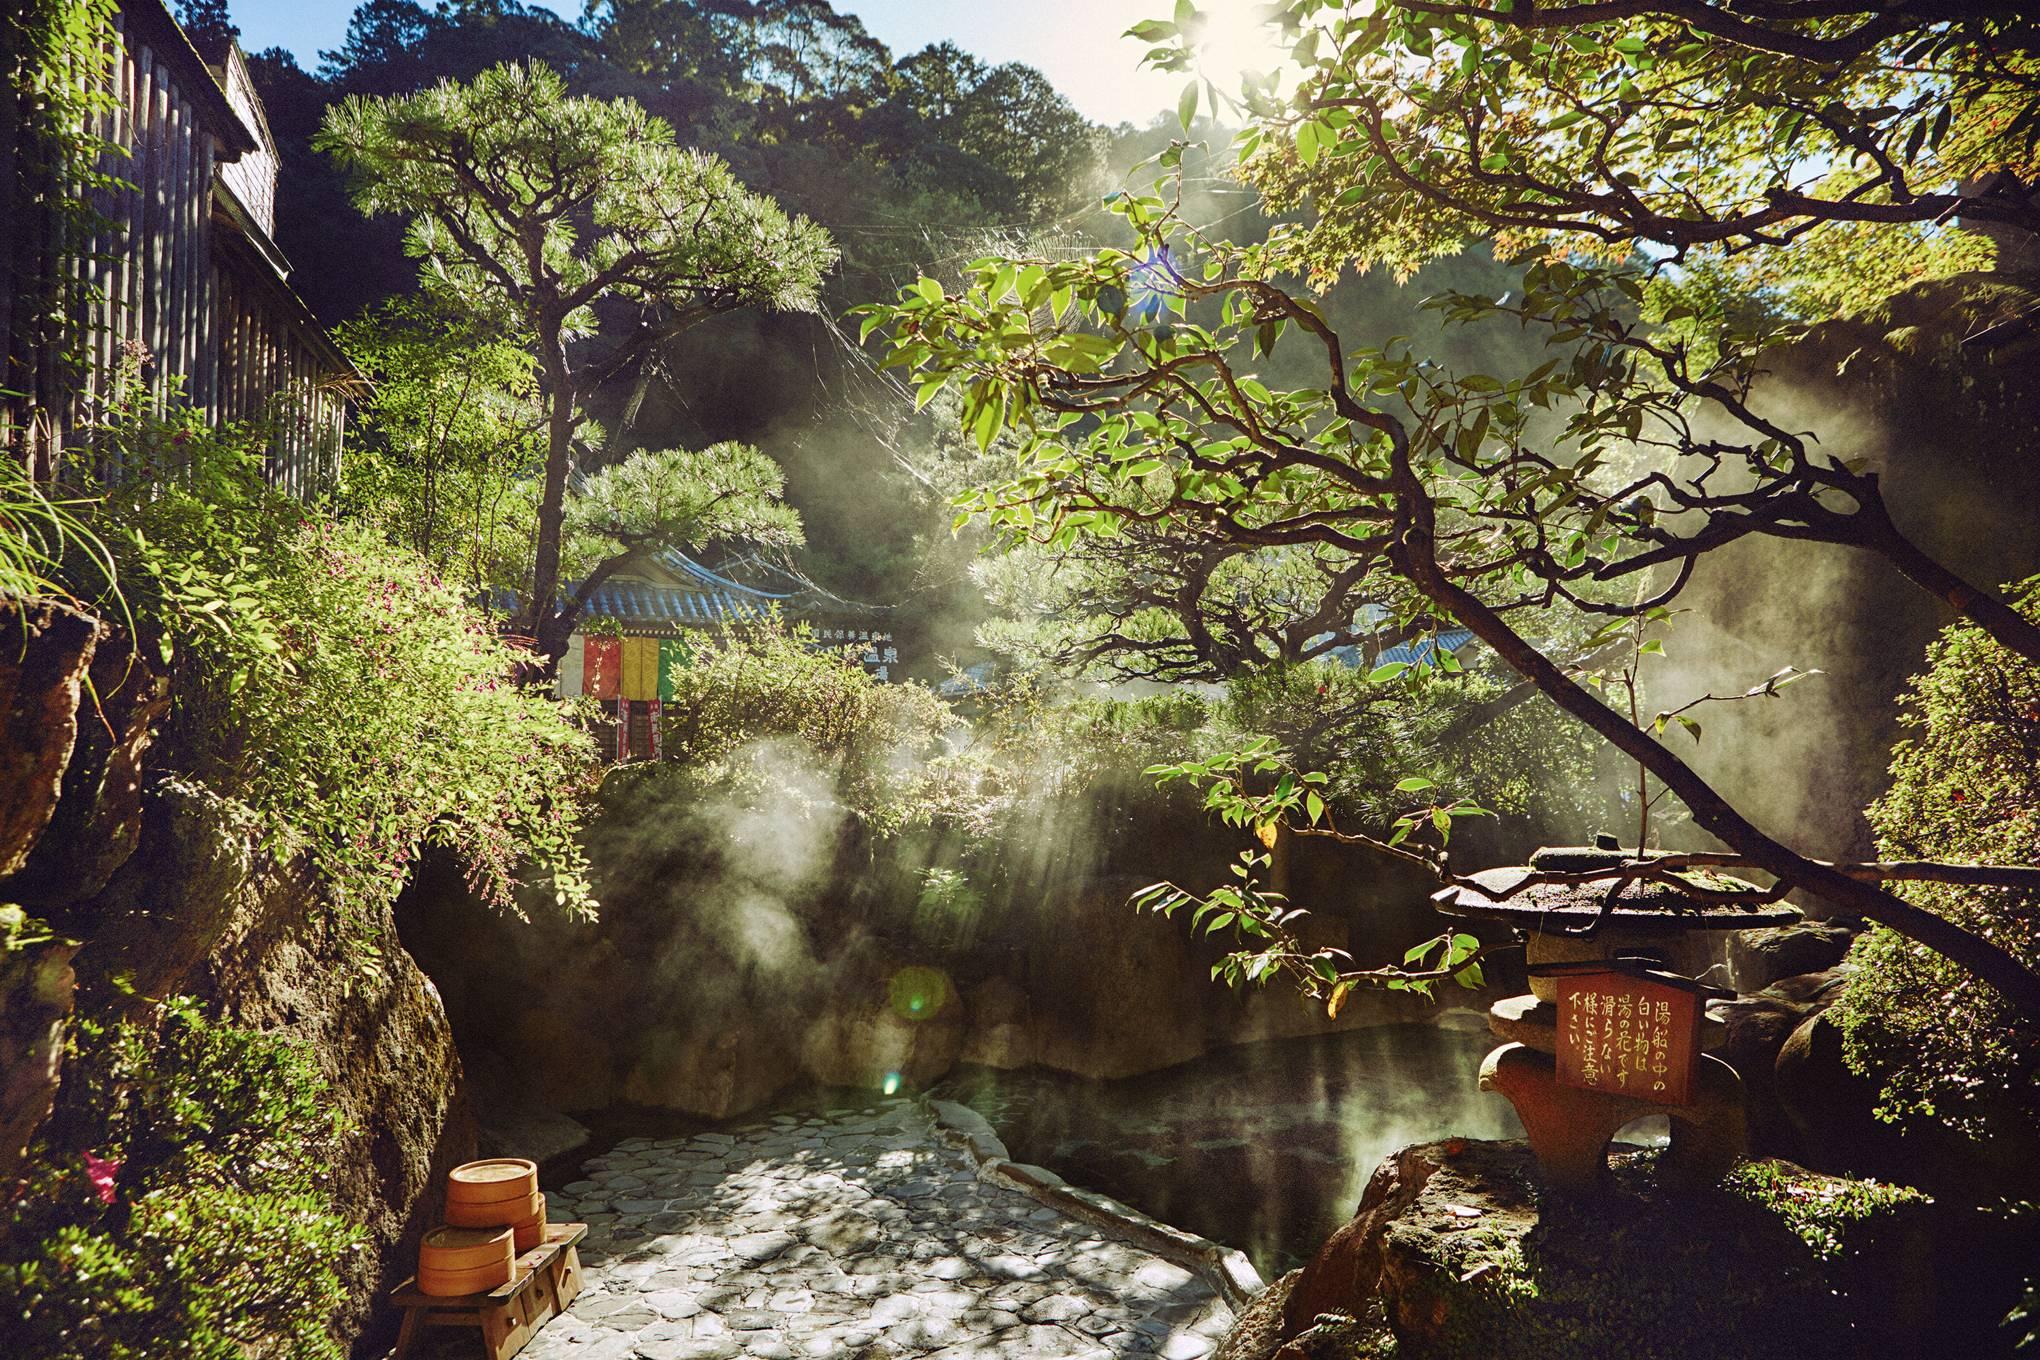 10 best holiday destinations 2018 | CN Traveller